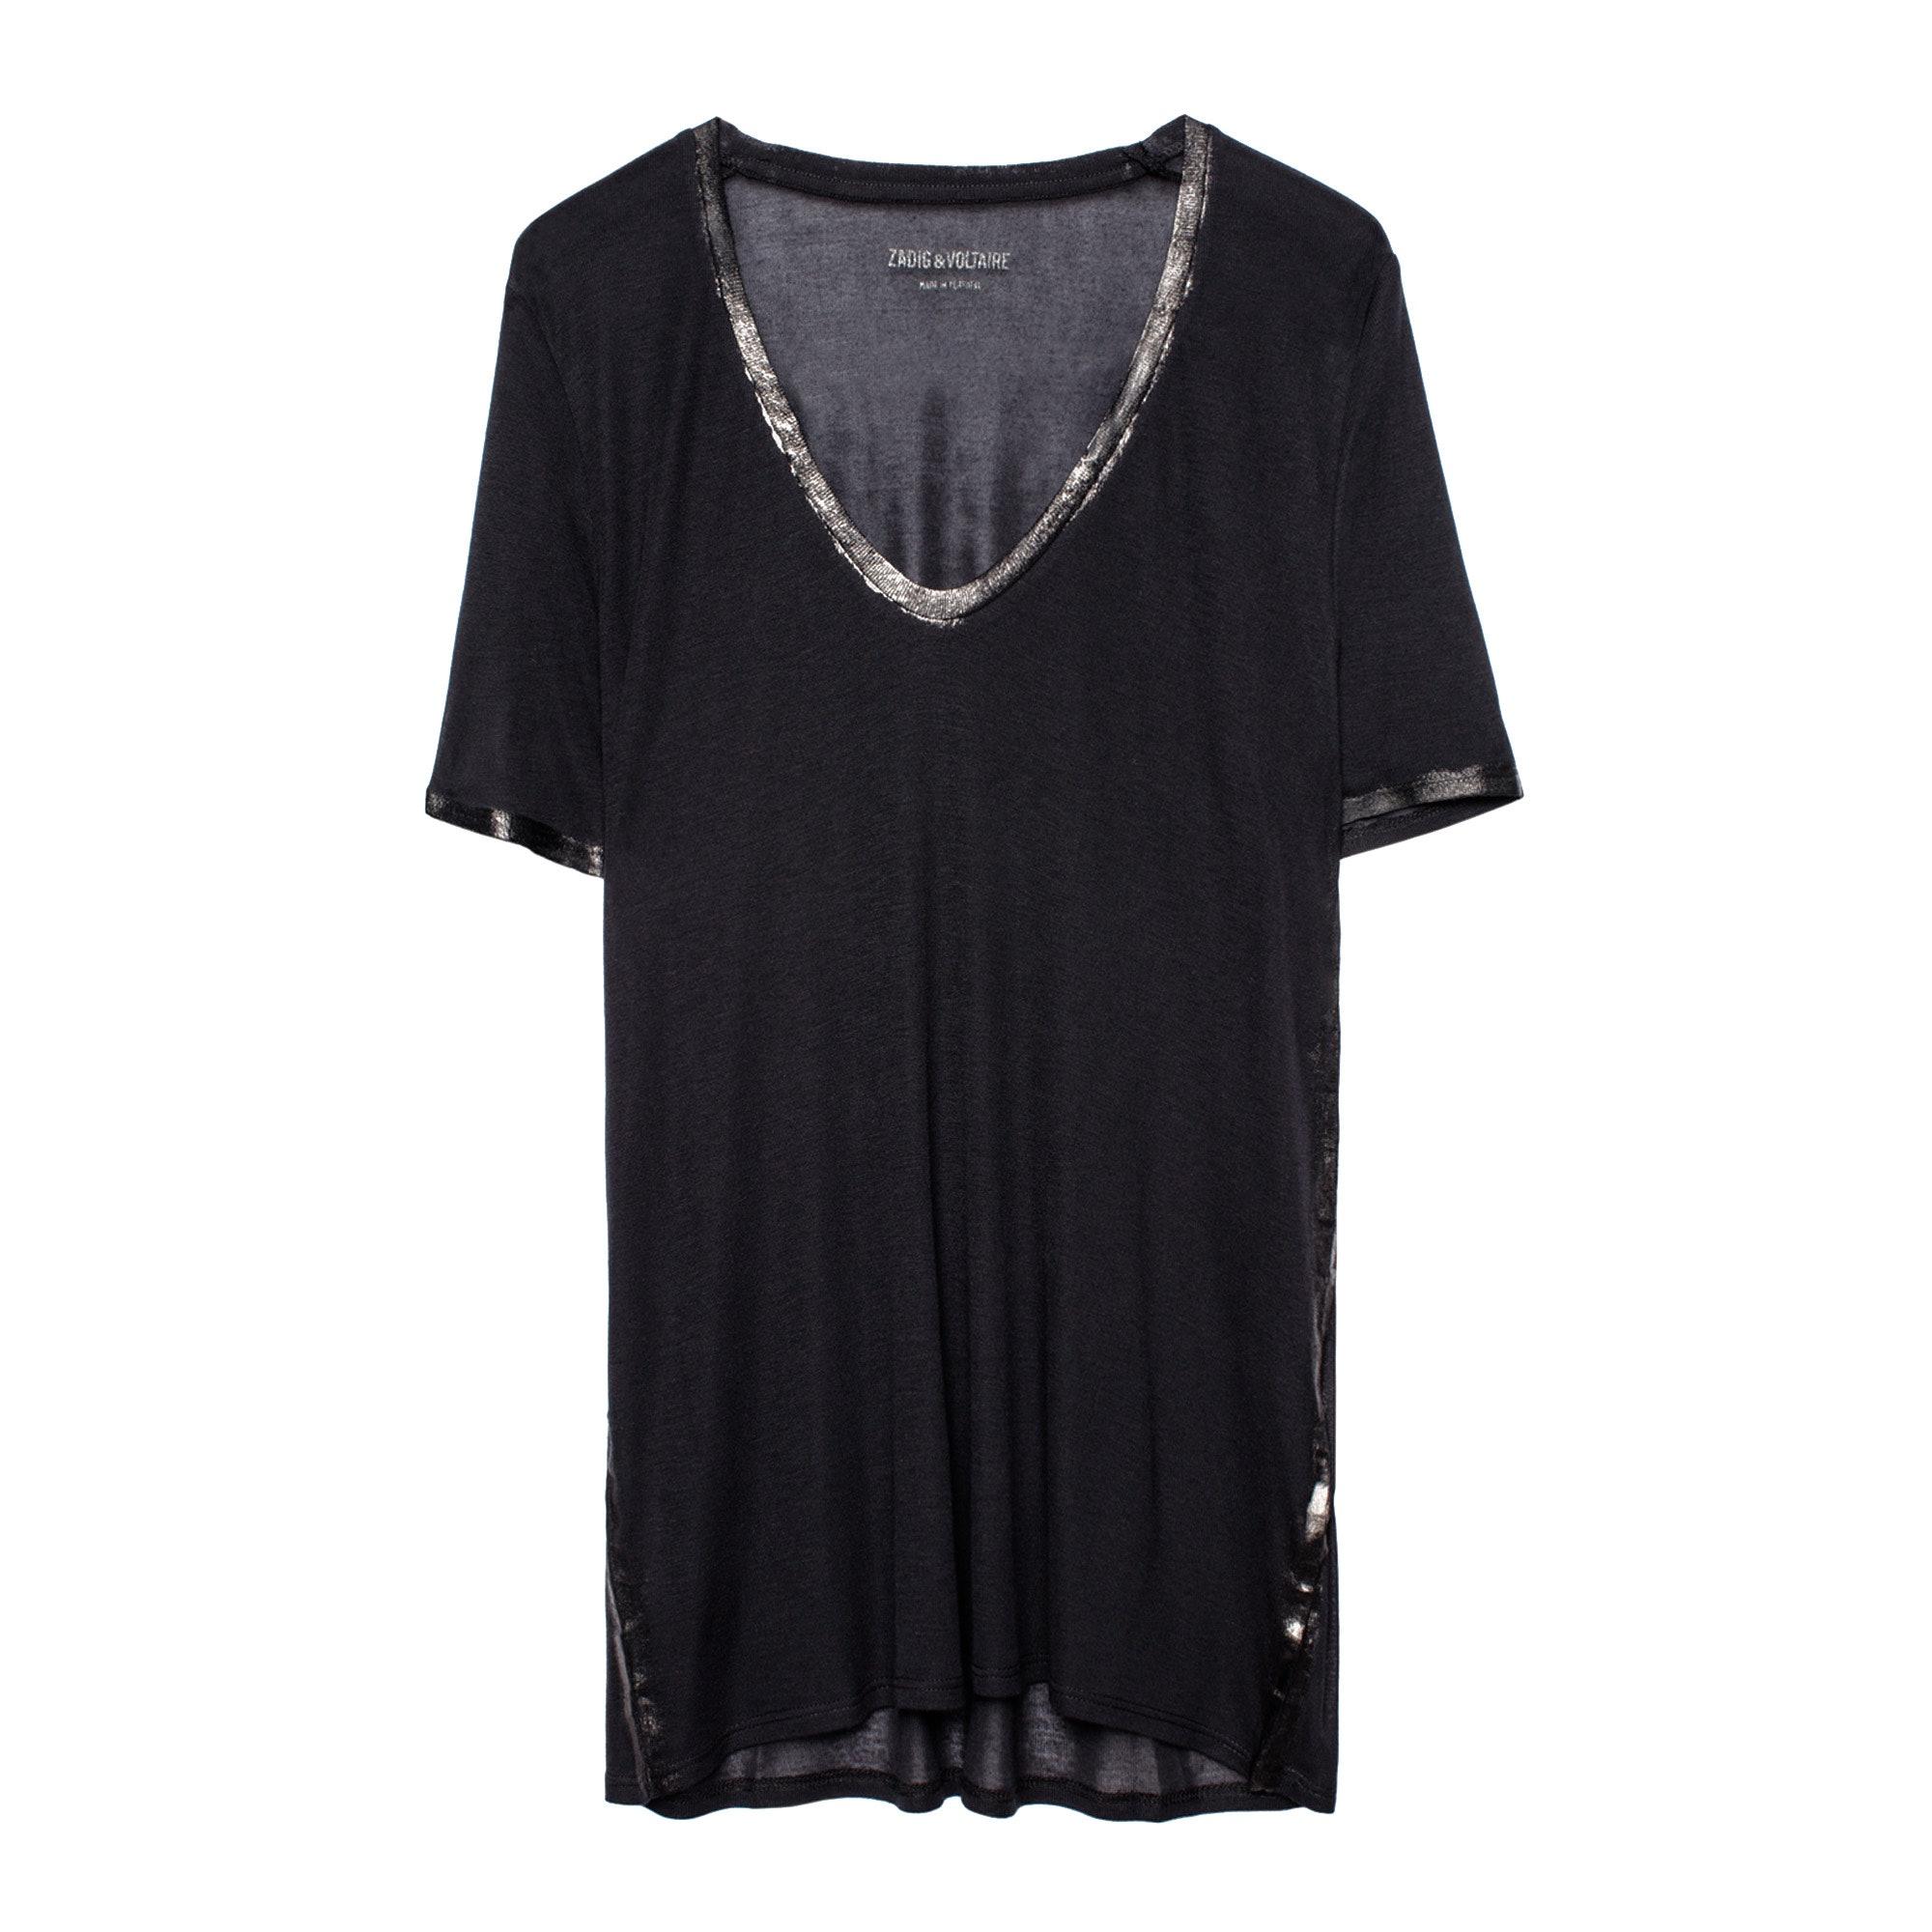 T-shirt Tino Foil - Taille XS  - Zadig & Voltaire - Modalova